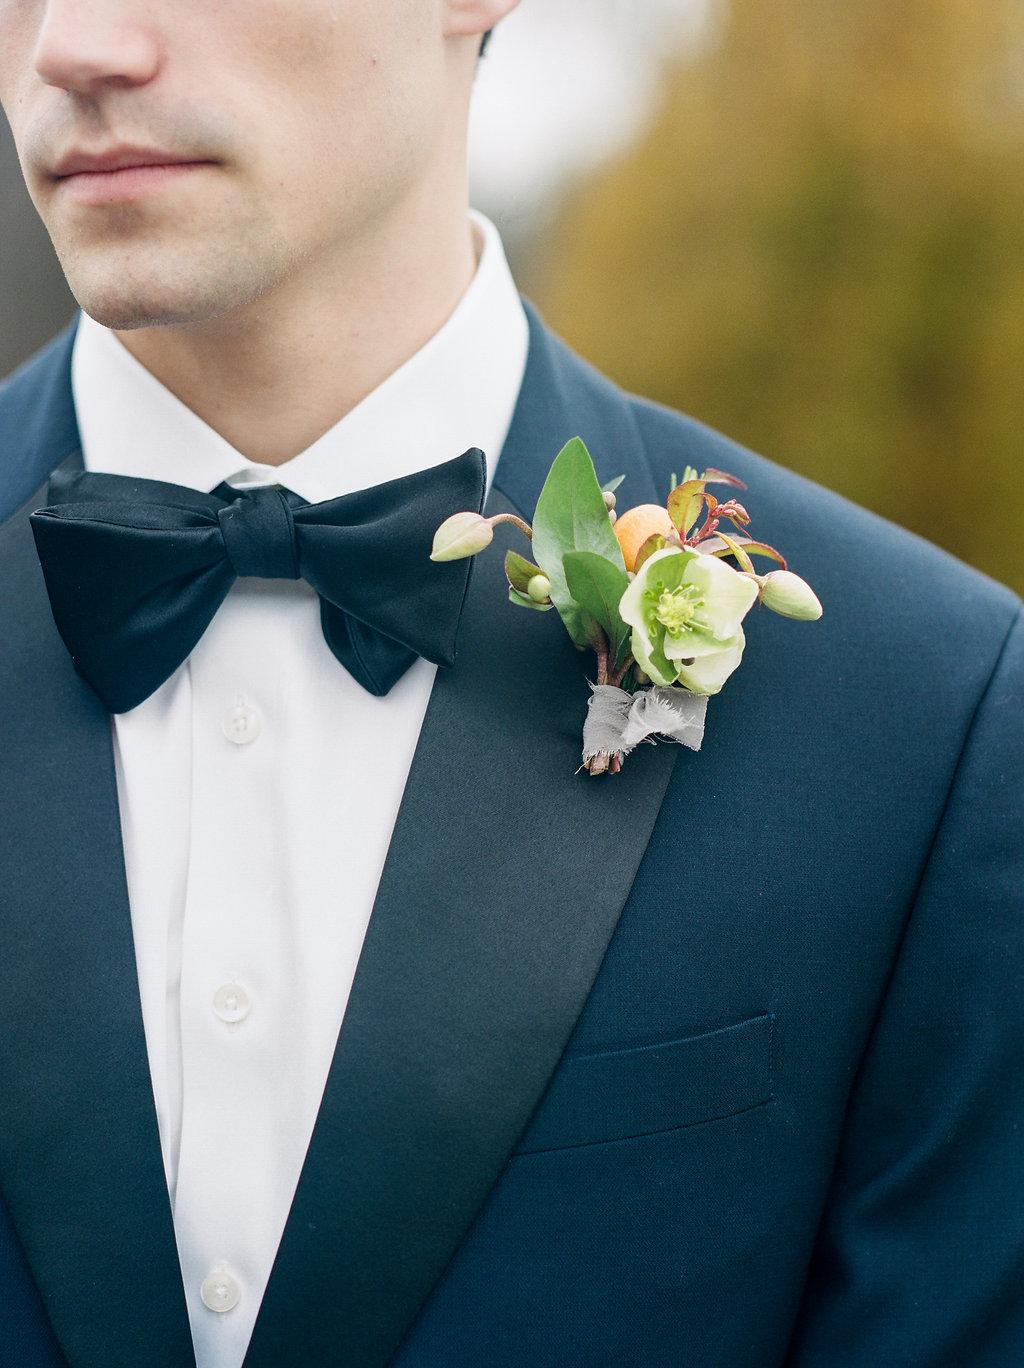 formal boutonniere ideas - photo by Lissa Ryan Photography http://ruffledblog.com/modern-romantic-wedding-ideas-with-family-heirlooms